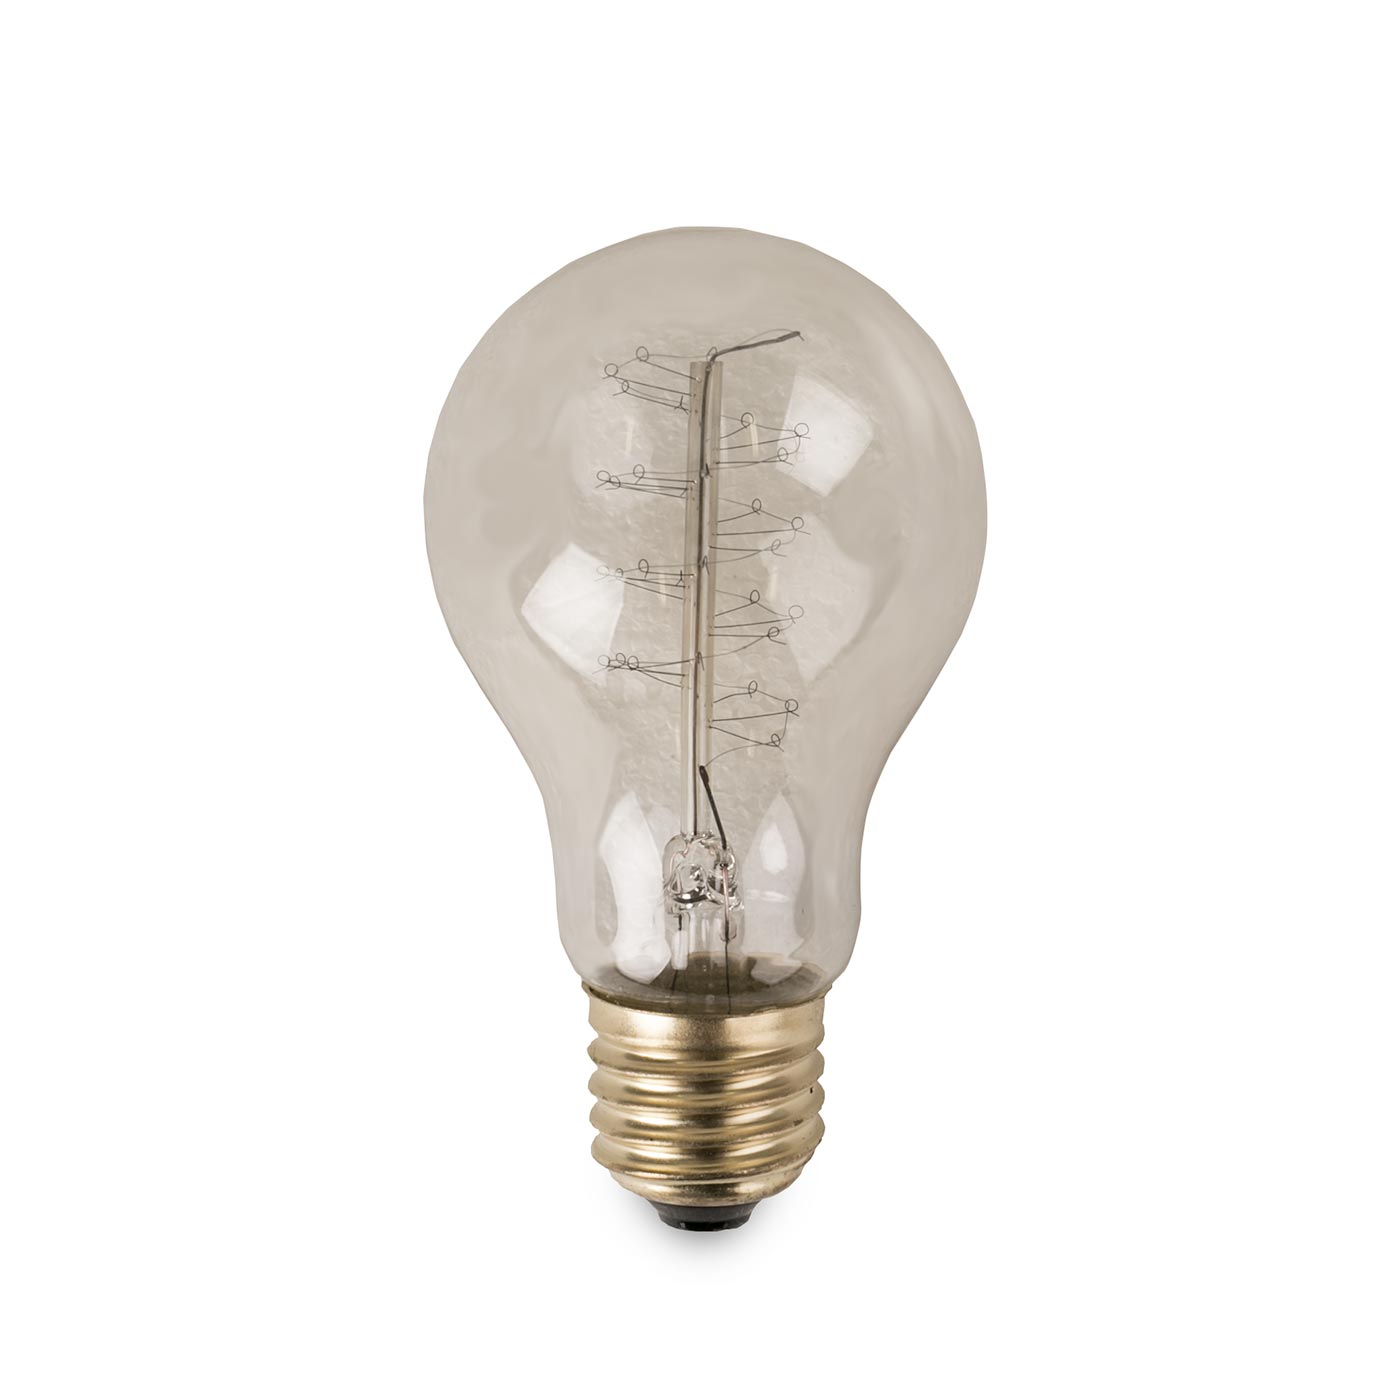 Twisted Vintage Filament Bulb E27 40W